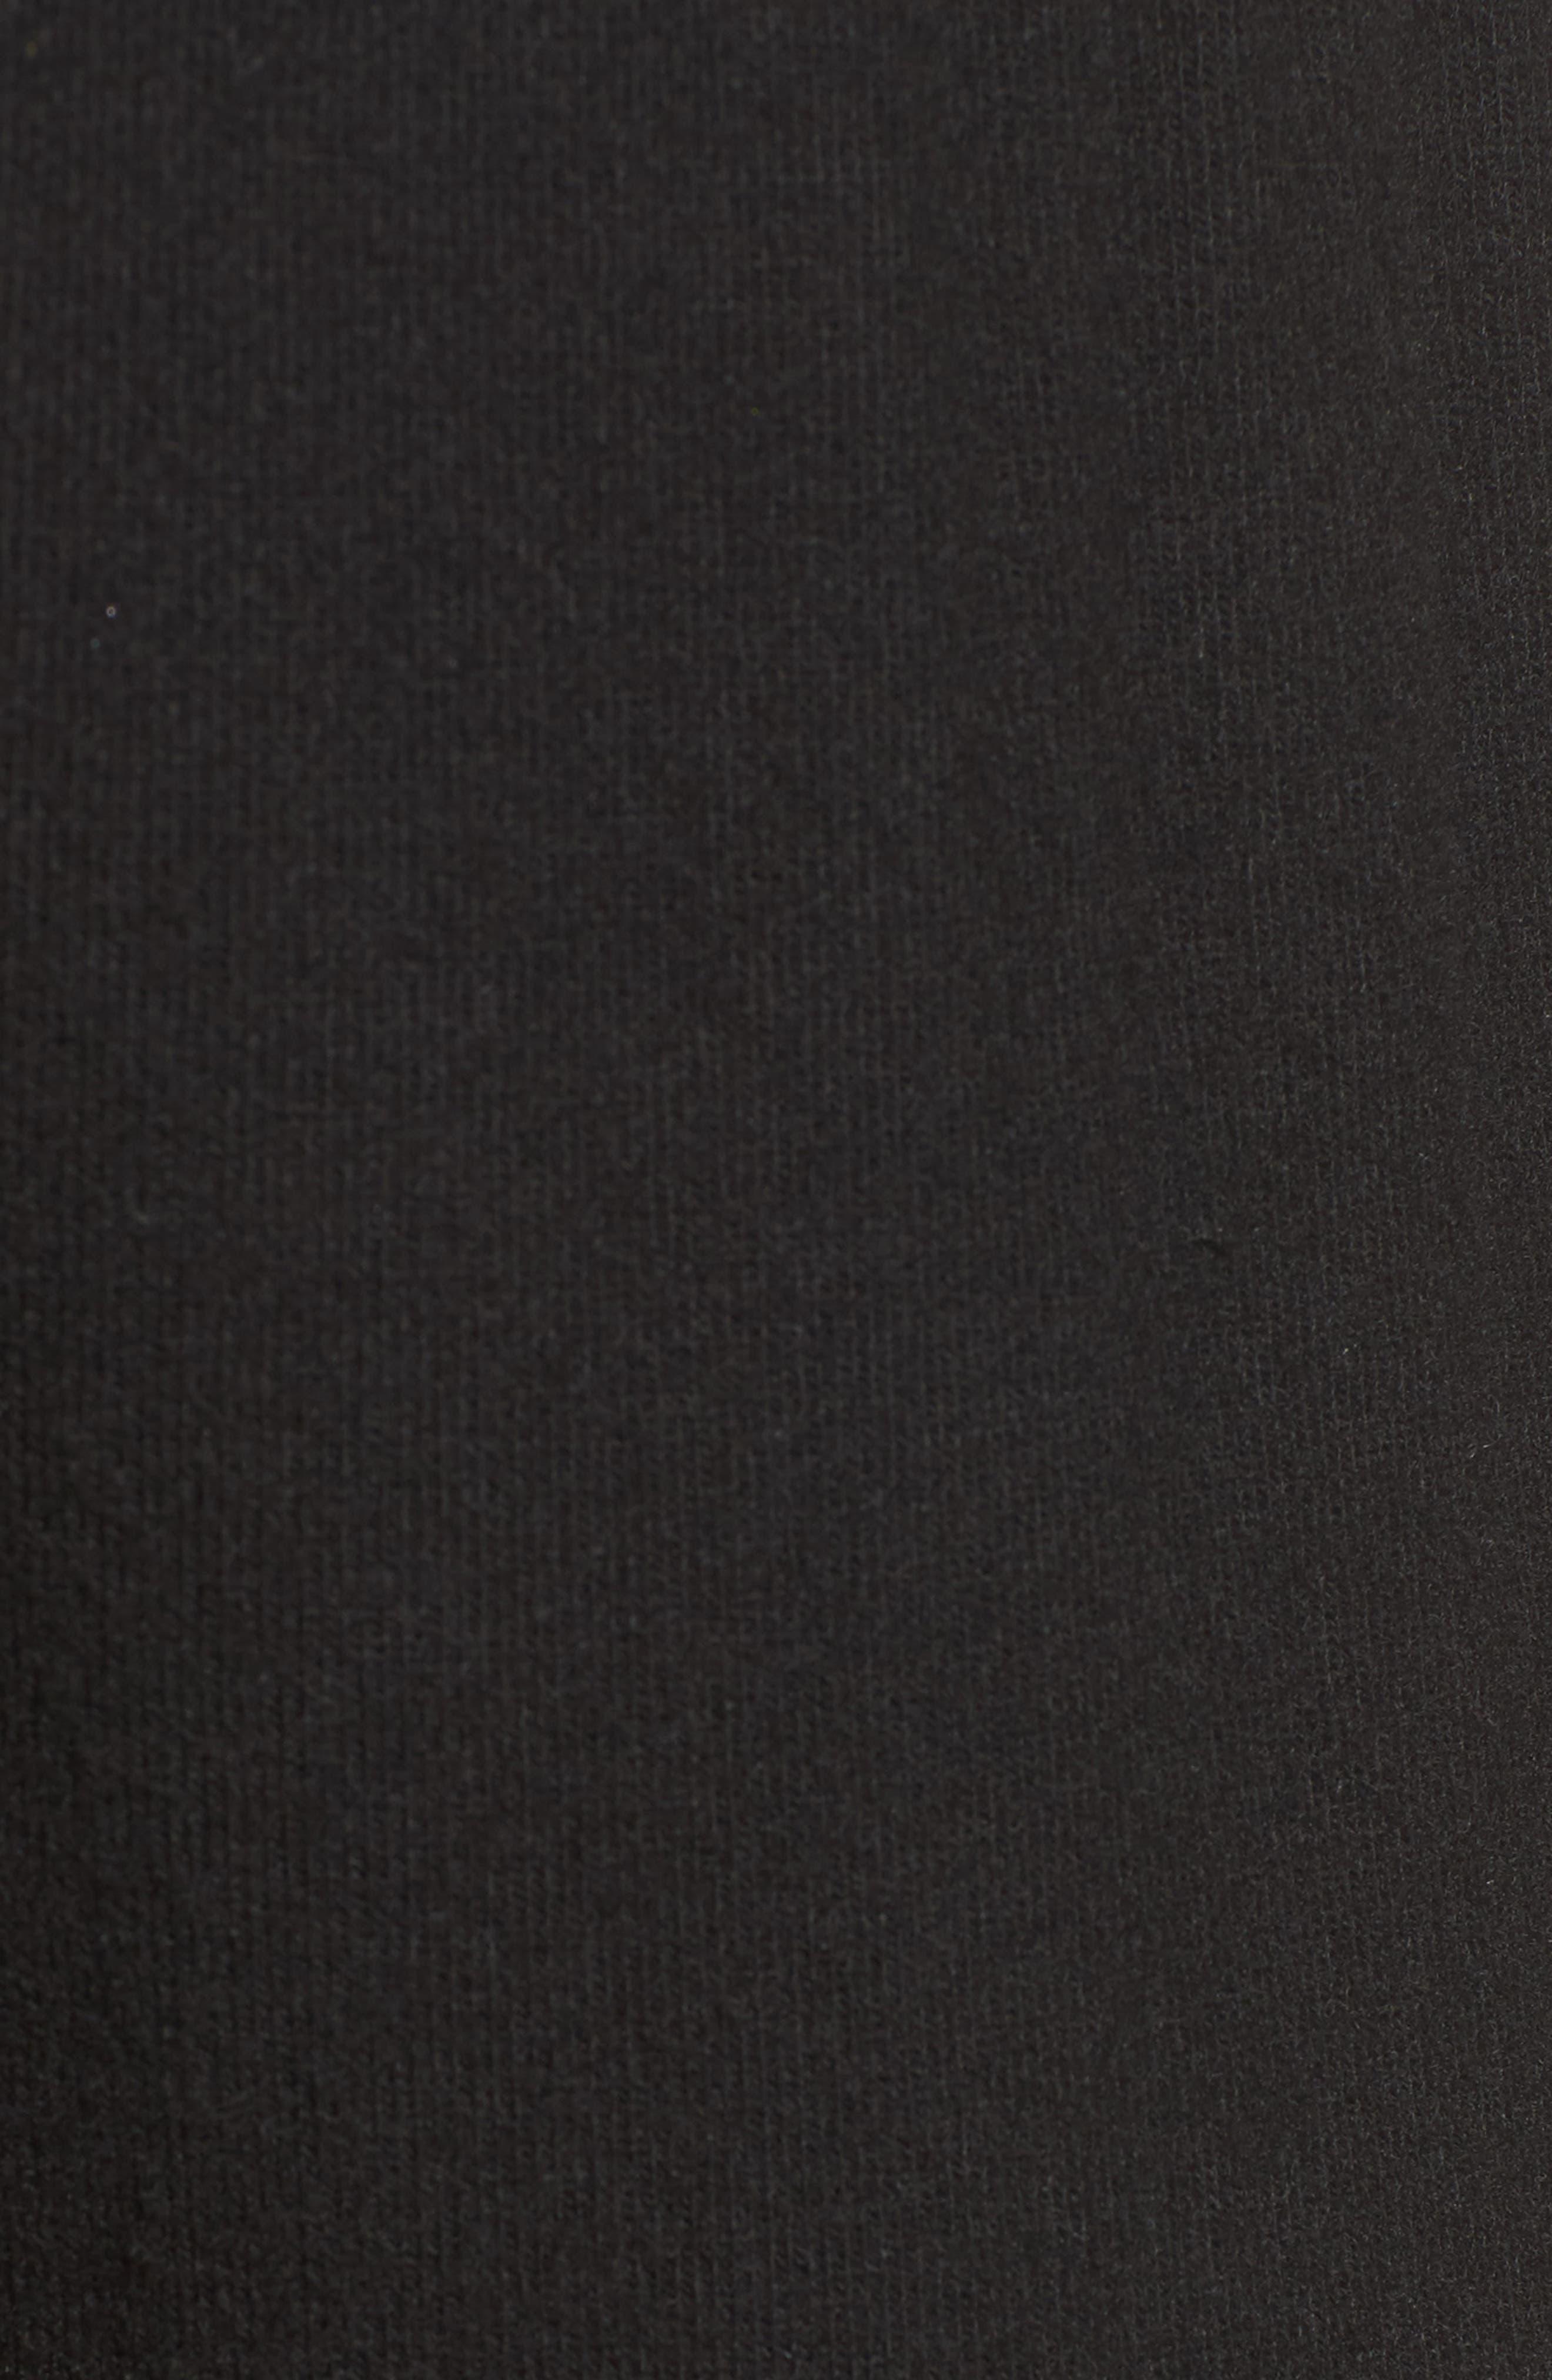 'Nate' Crop Sweatpants,                             Alternate thumbnail 5, color,                             Jet Black